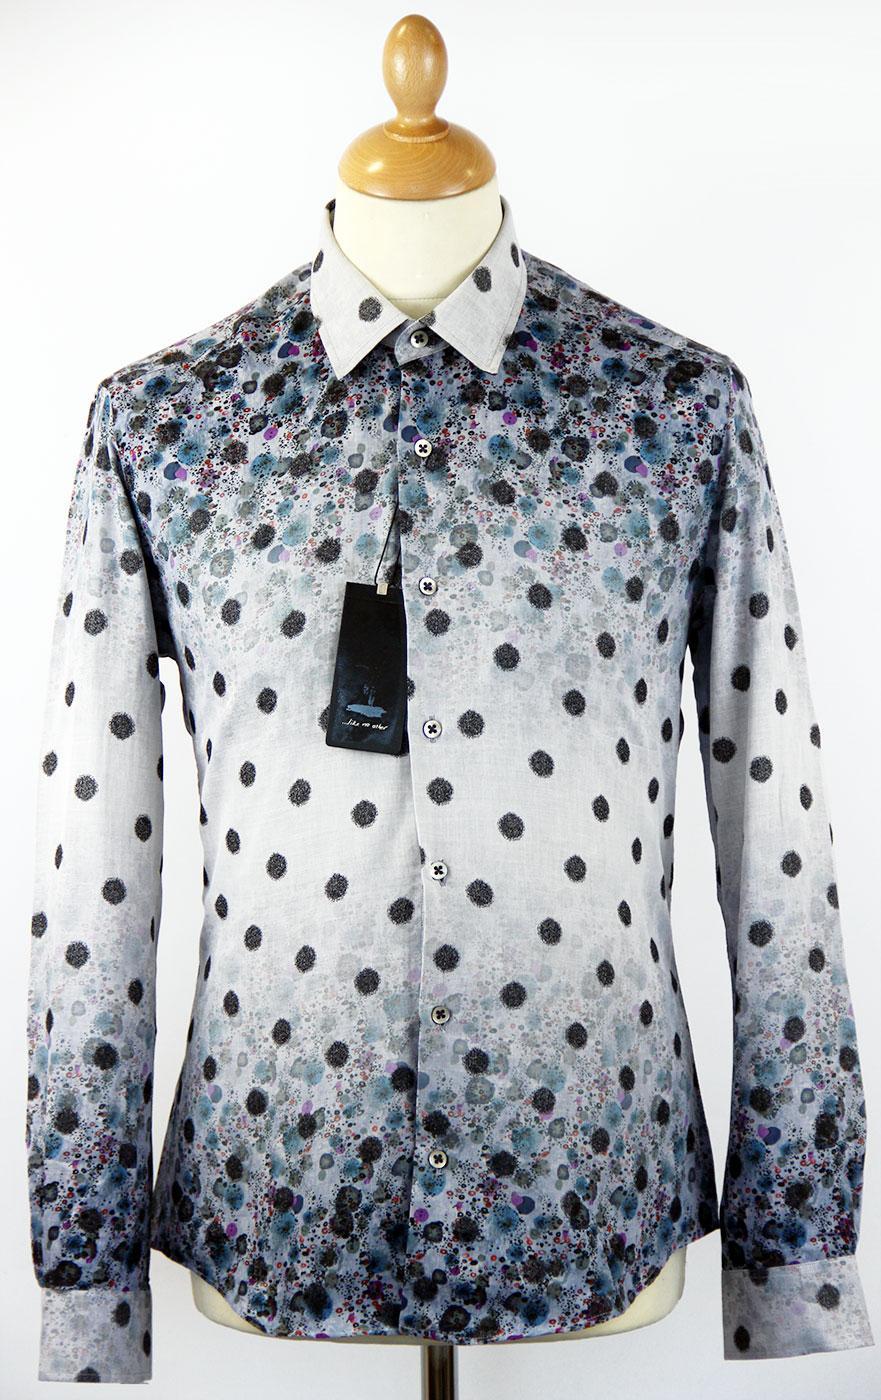 Medusa 1 LIKE NO OTHER Mod Smudgy Polka Dot Shirt